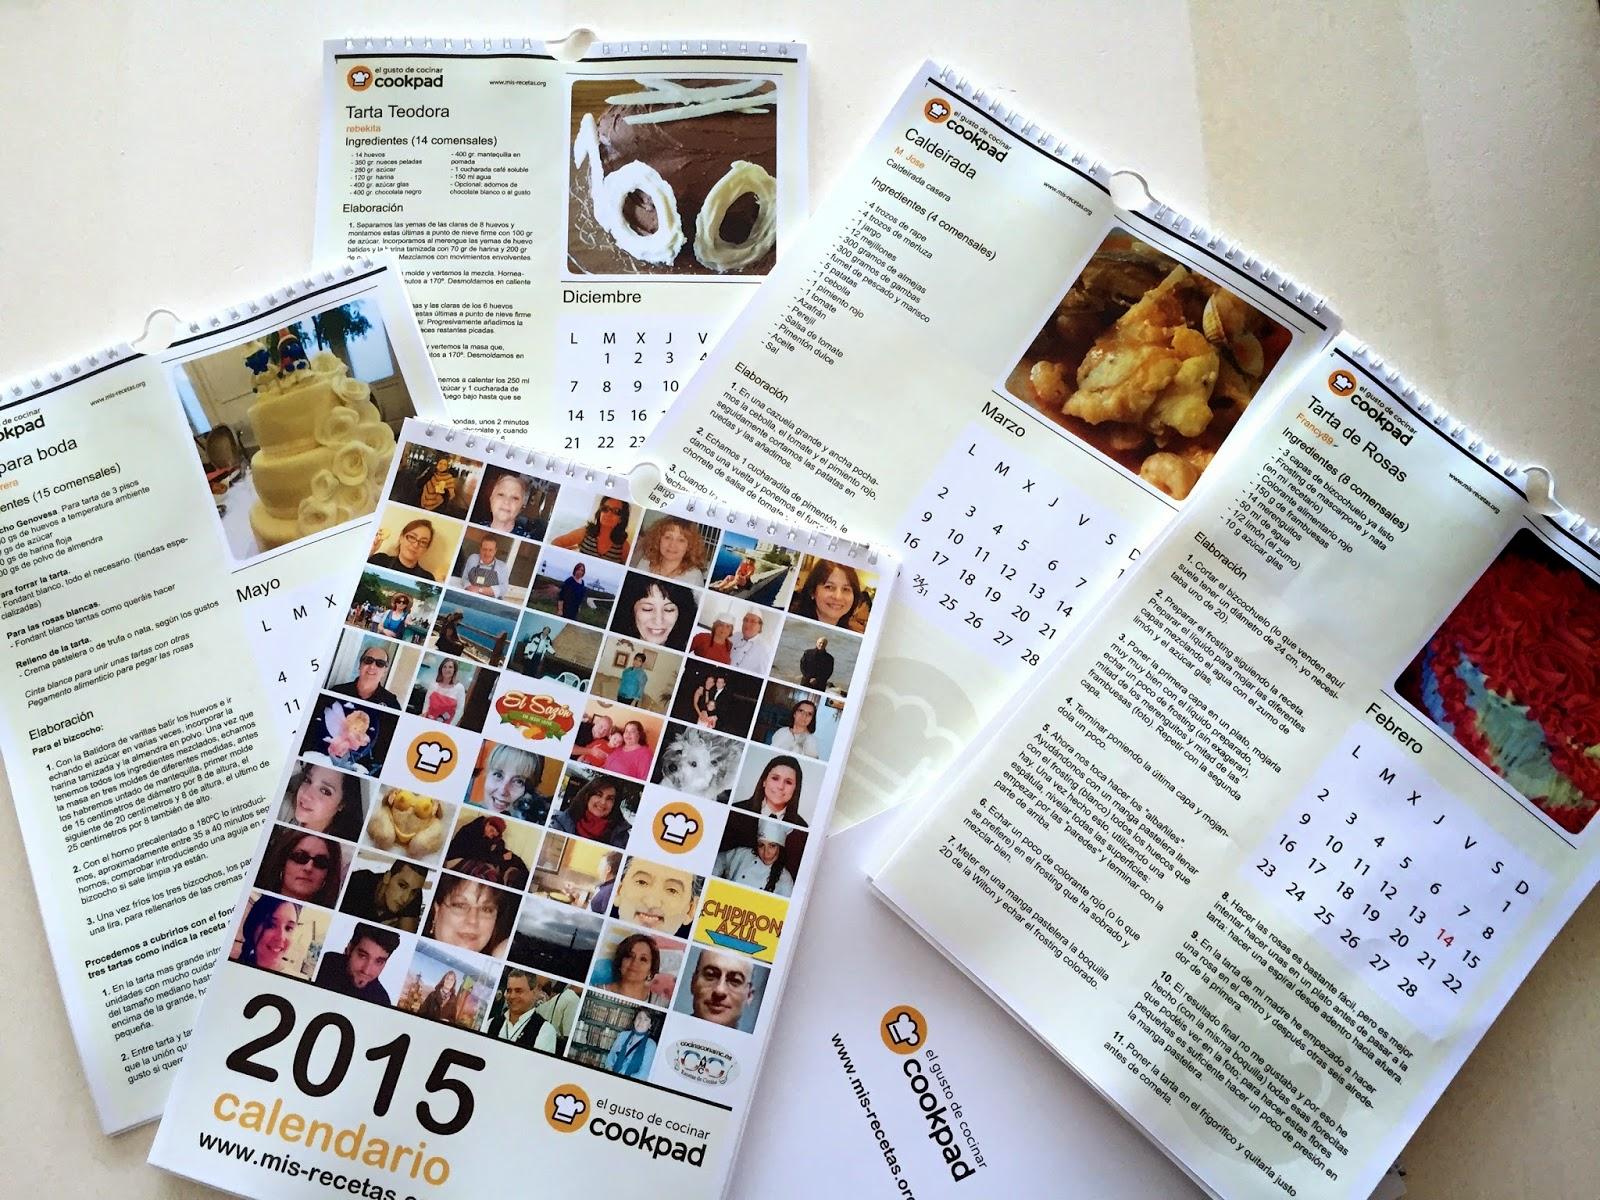 Calendarios de recetas Cookpad 2015